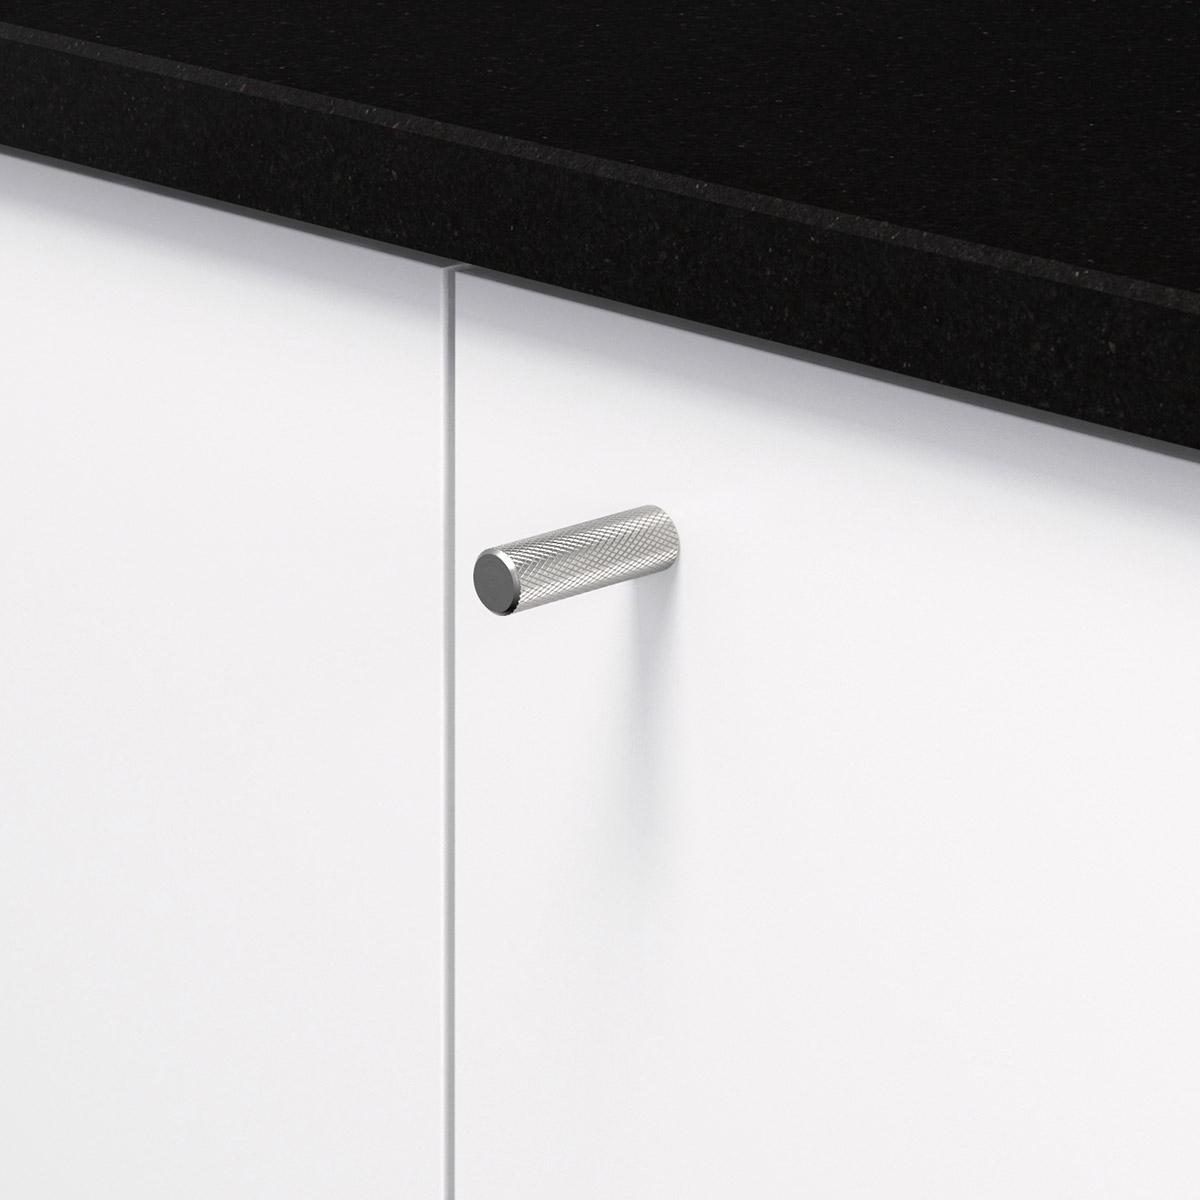 Knopp rostfri look 370225 11 10 mm ncs s 0300 n granit svart